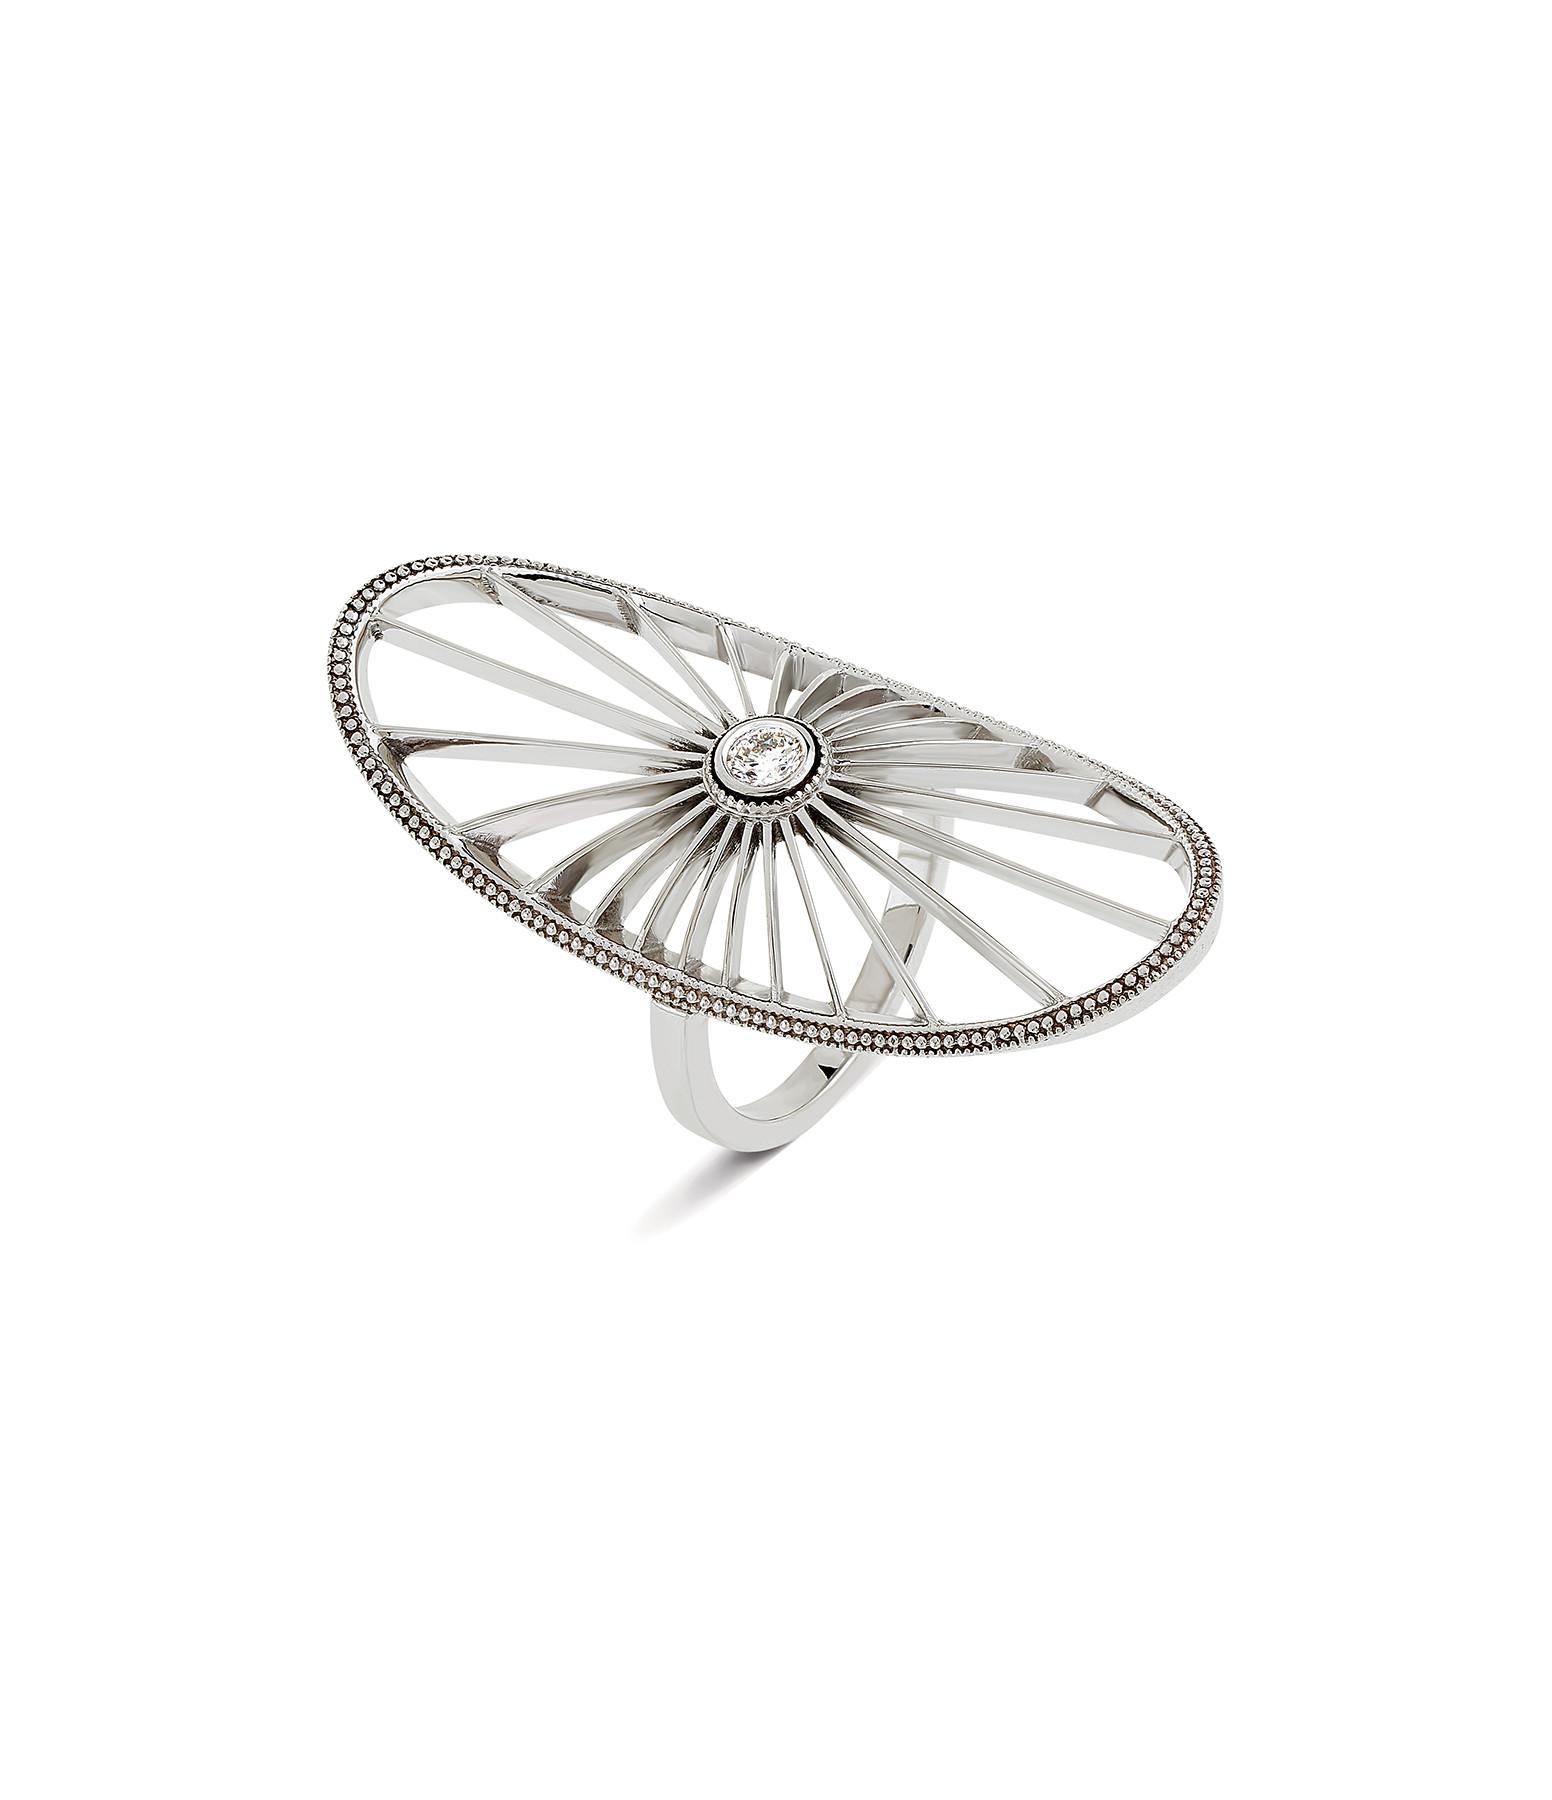 NAVA JOAILLERIE - Bague Cheyenne Ovale Diamants Or Blanc